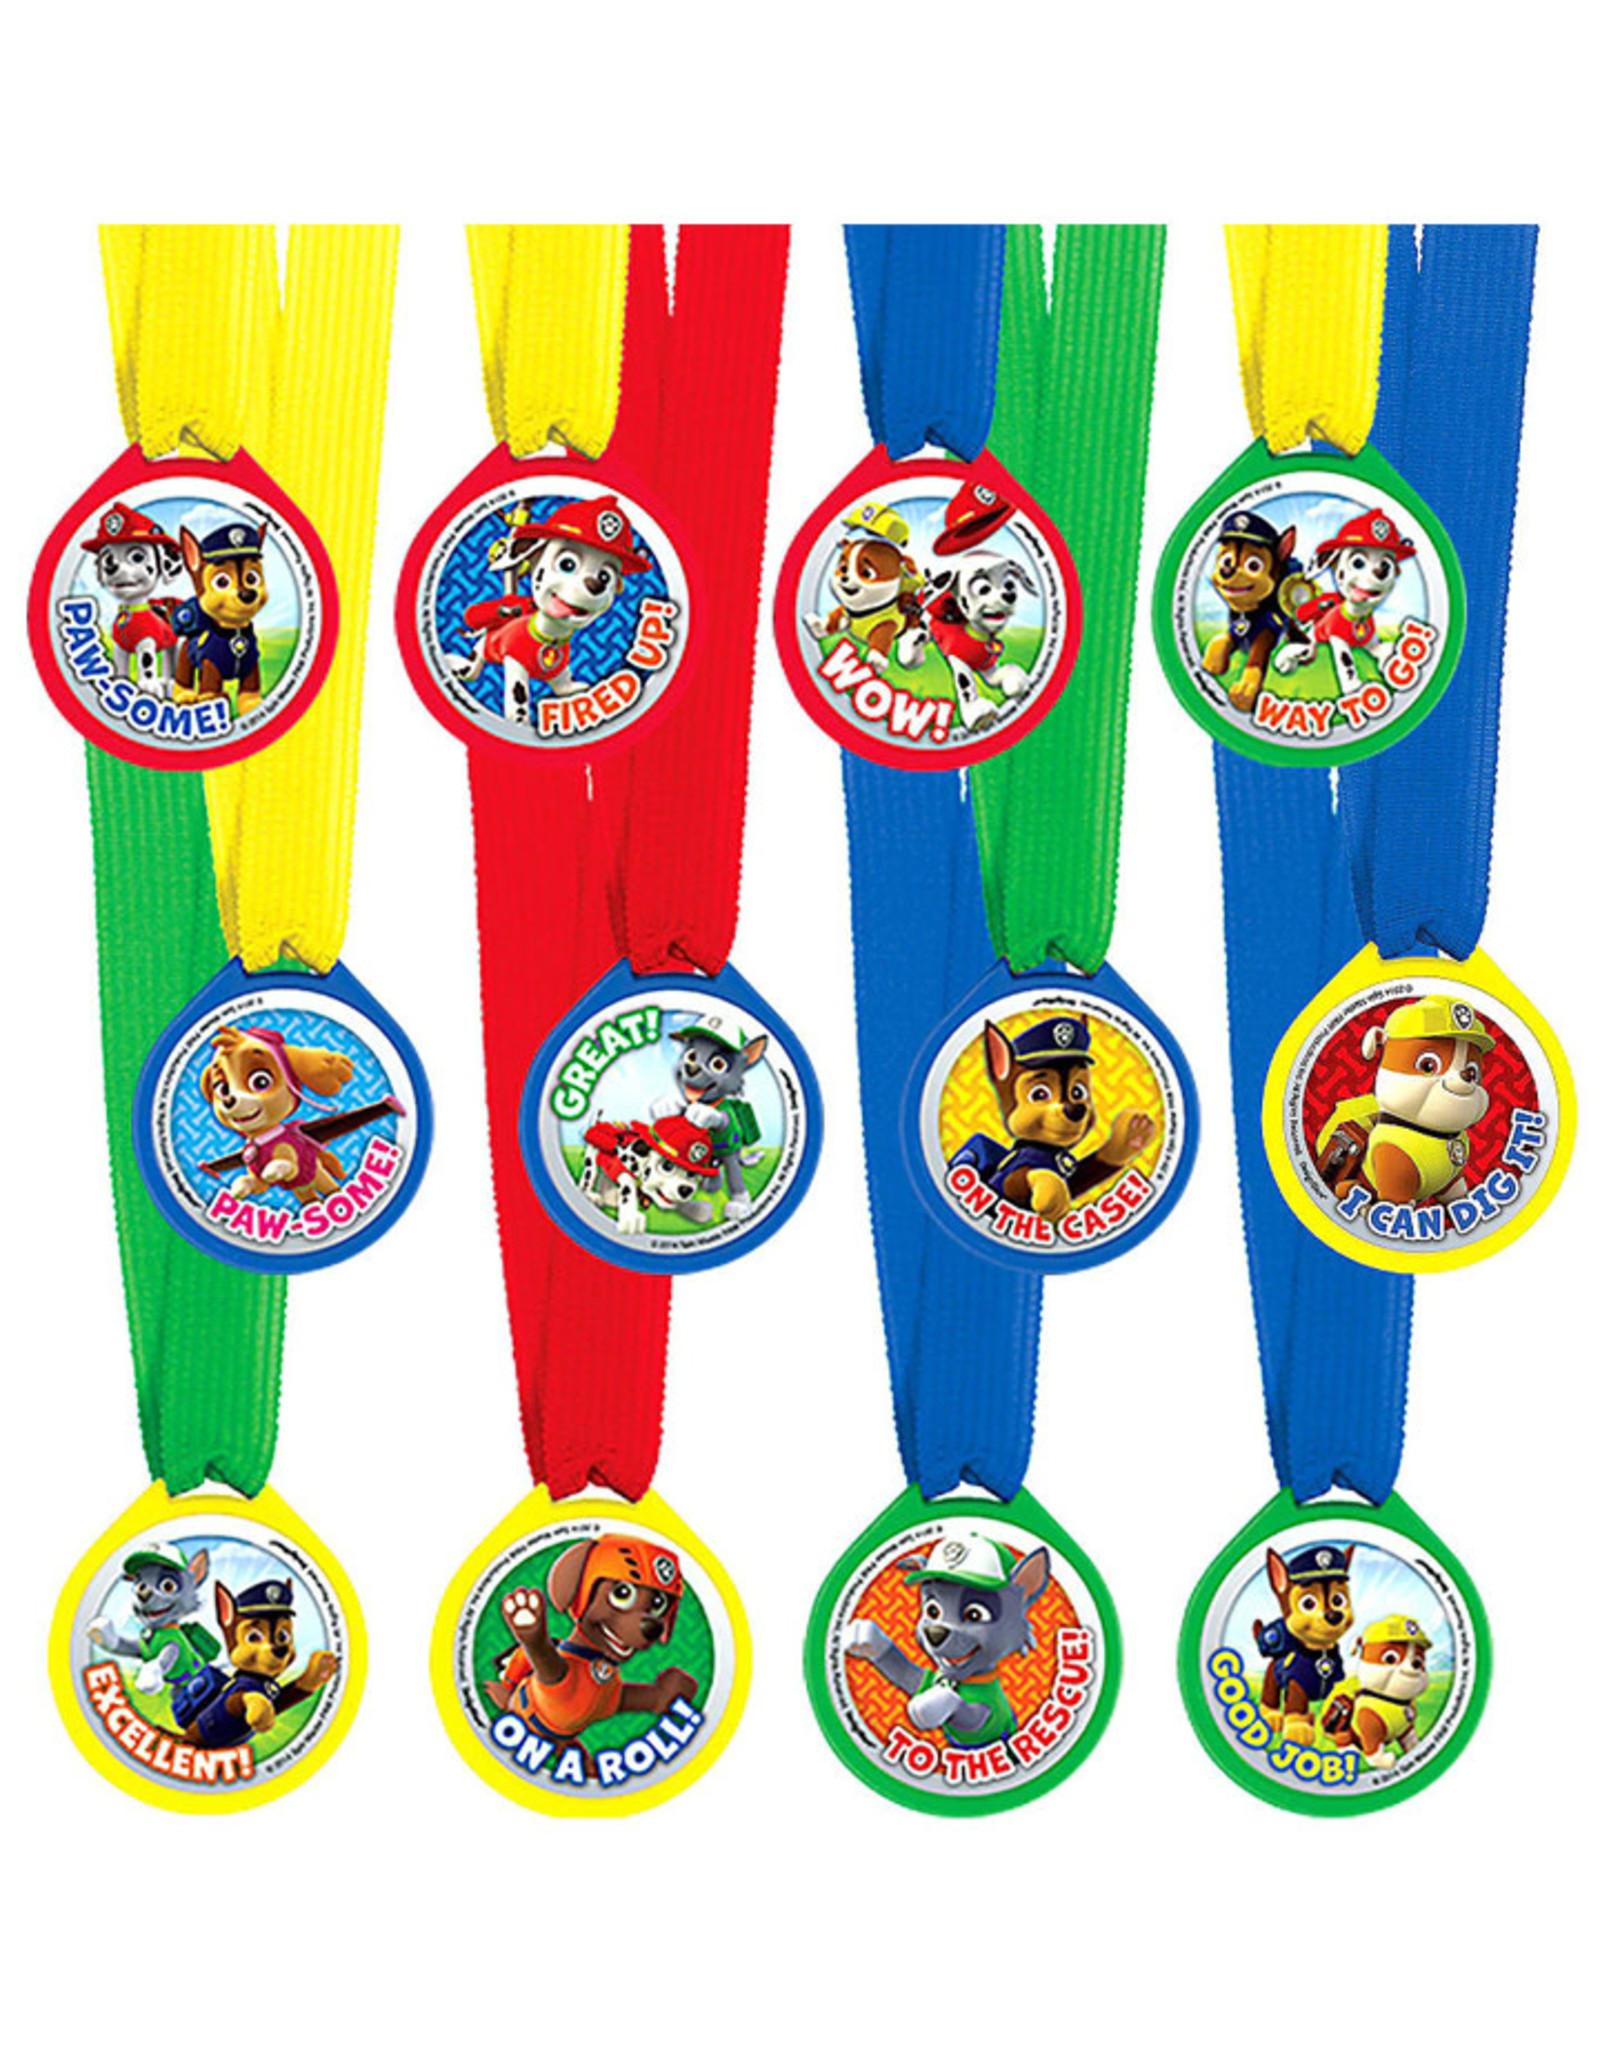 PAW Patrol Award Medals - 12ct